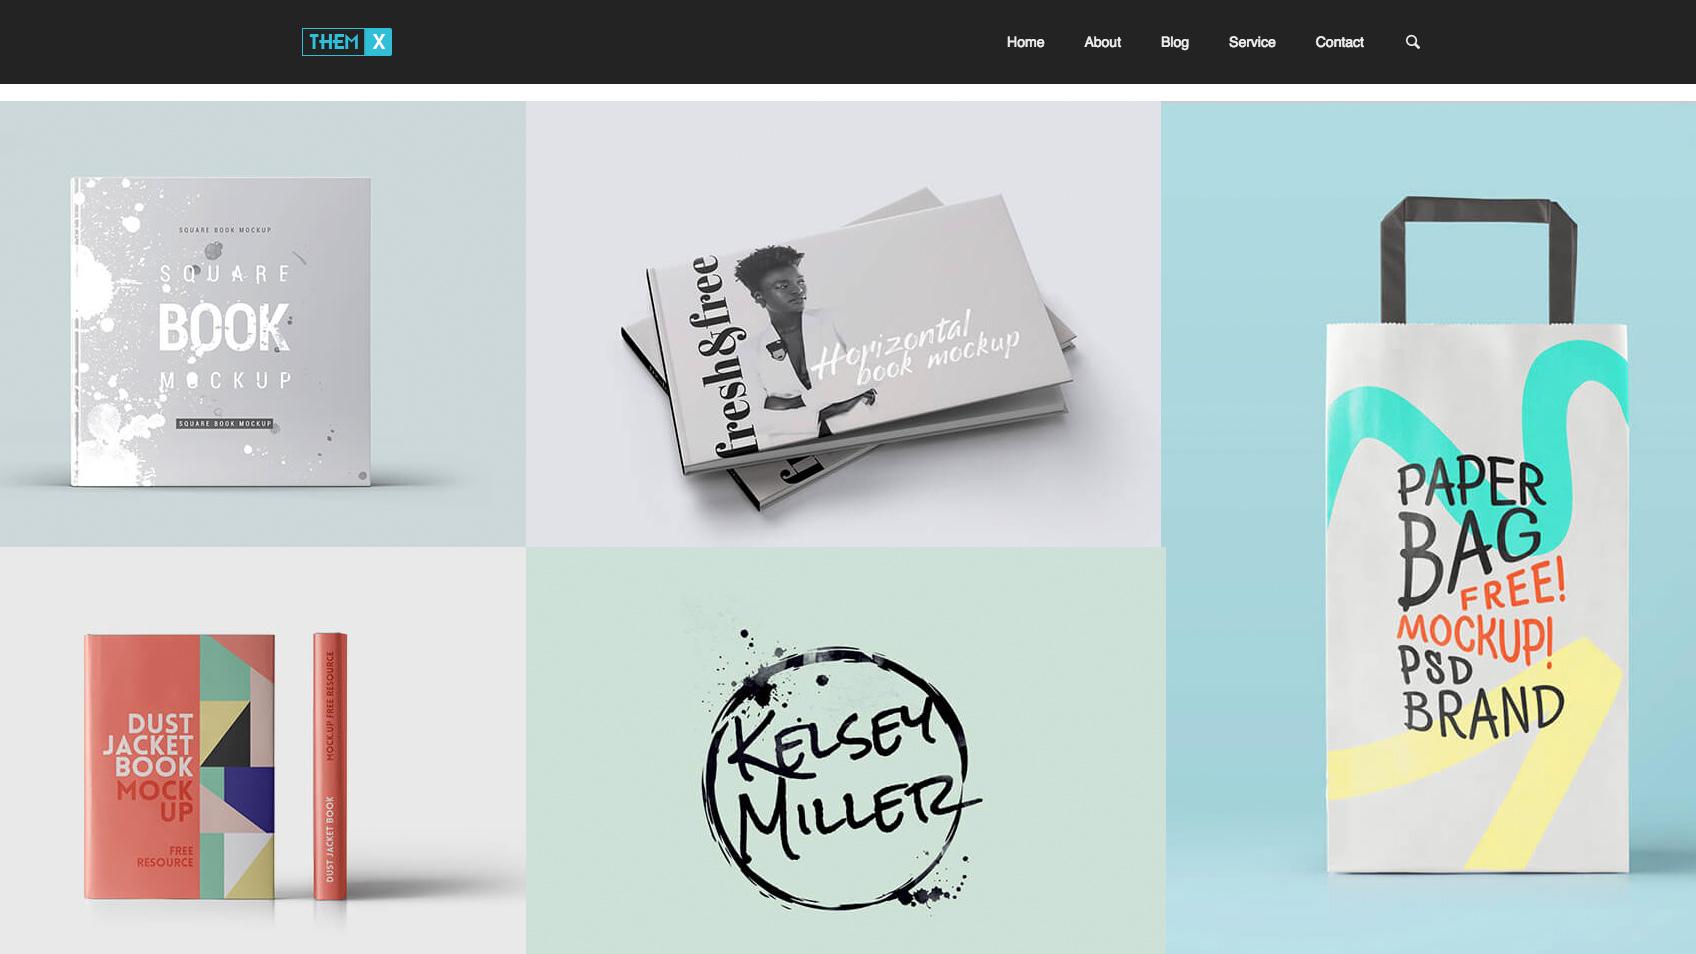 21 Best Free Wordpress Themes Creative Bloq